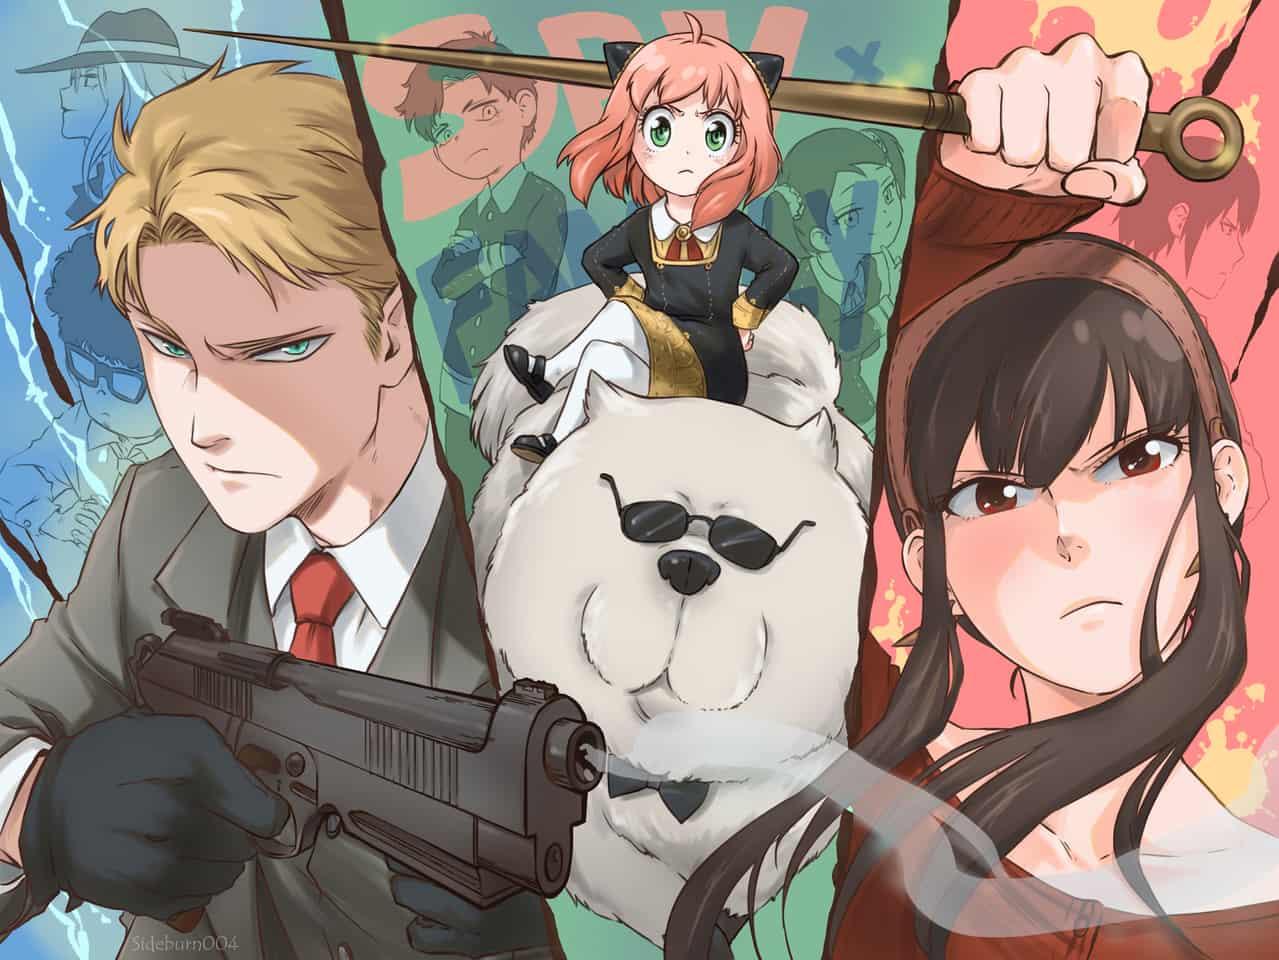 Spy X Family Illust of Sideburn004 SPY×FAMILY_Contest ヨル・フォージャー アーニャ・フォージャー ロイド・フォージャー